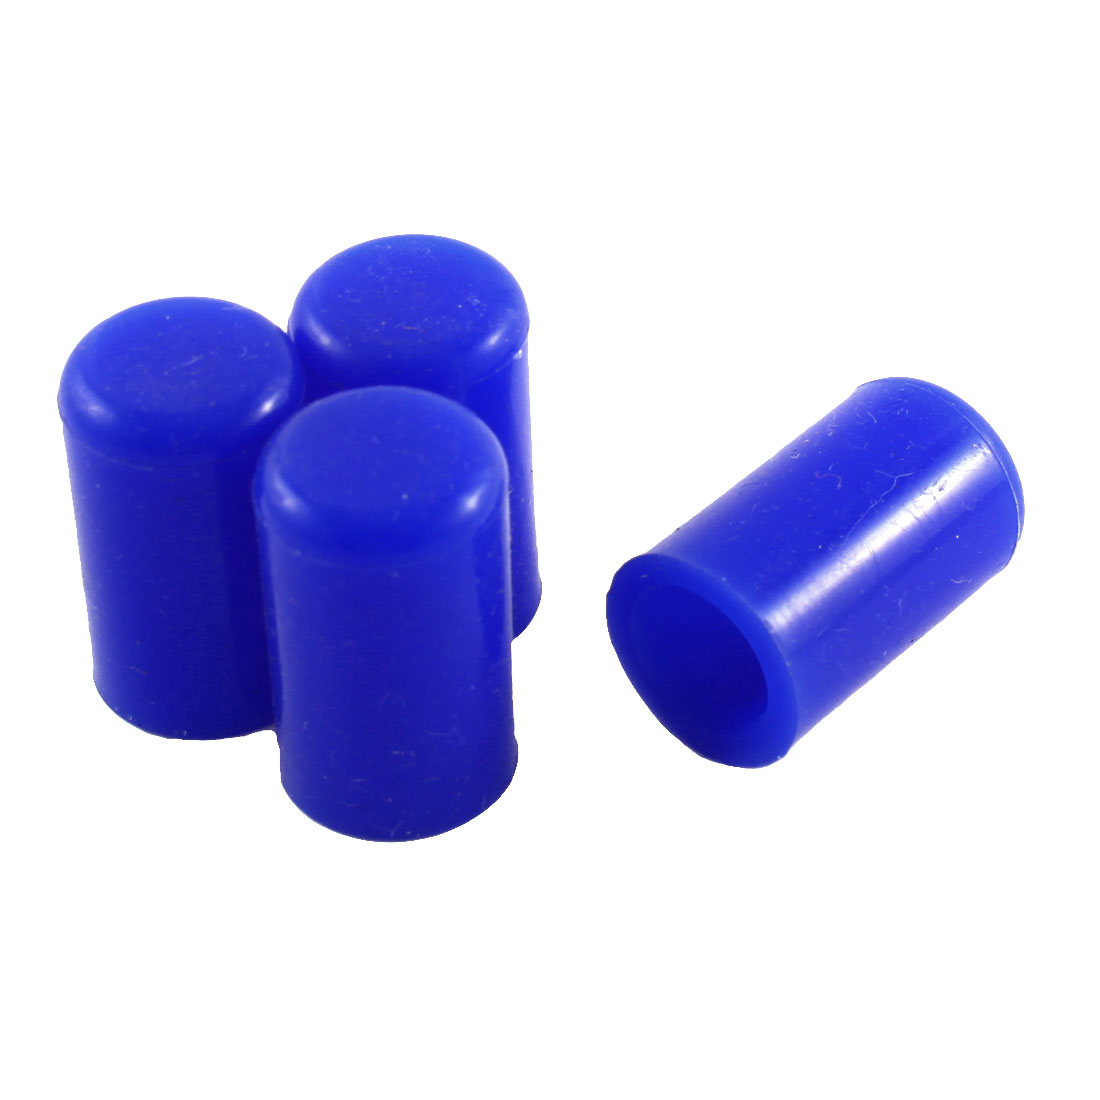 "Blue 12mm 15/32"" Silicone Blanking Cap Intake Vacuum Hose End Bung 4pcs"